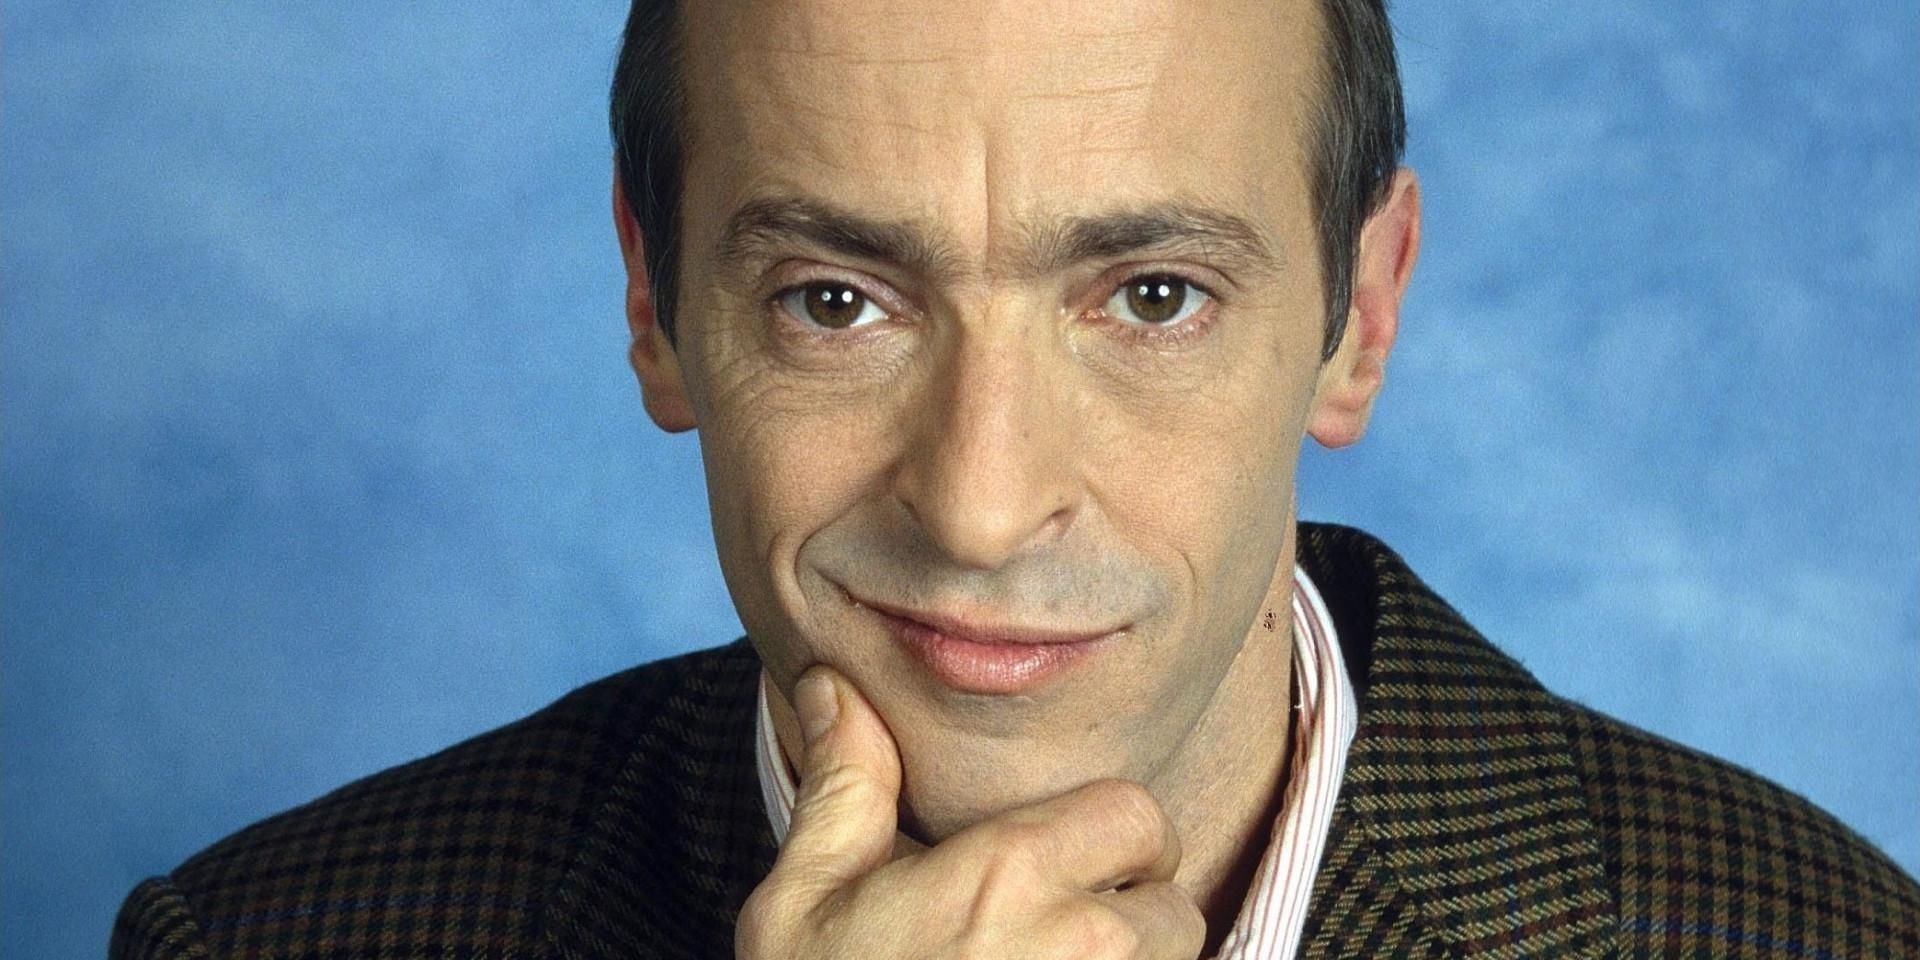 11 David Sedaris Quotes That Will Change Your Life